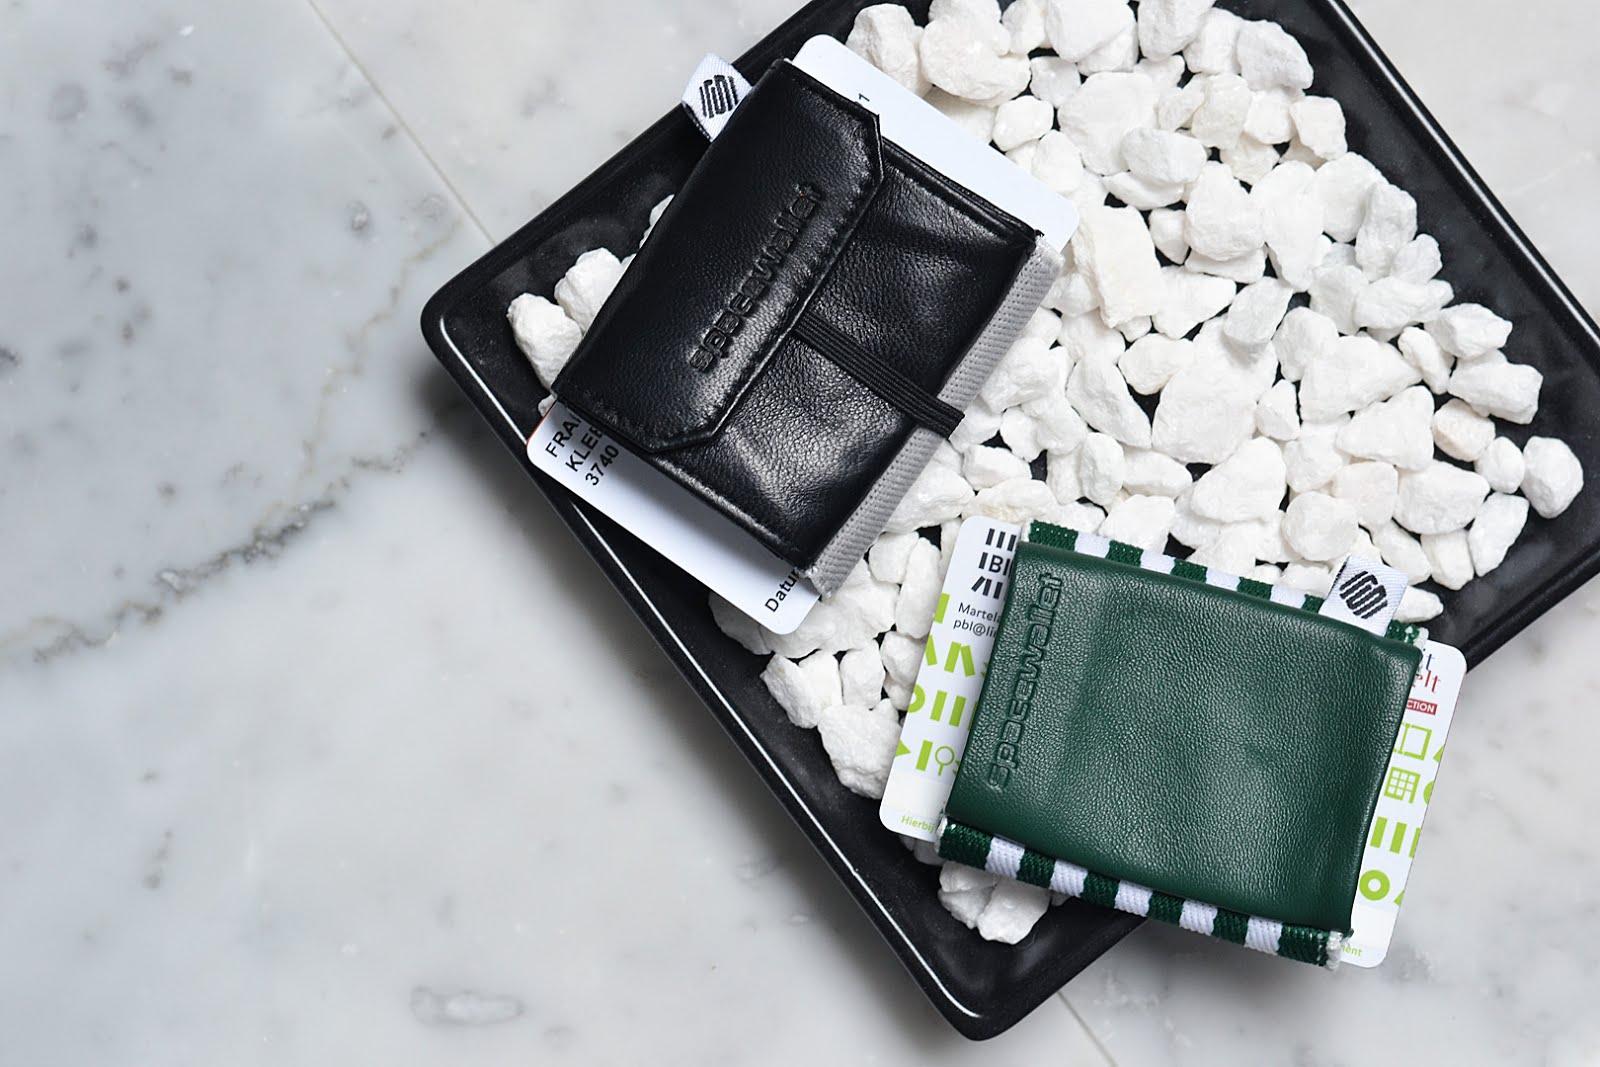 Space wallet, innovation, mini portemonnee, mini wallet, polar fox, tropic green, win, giveaway